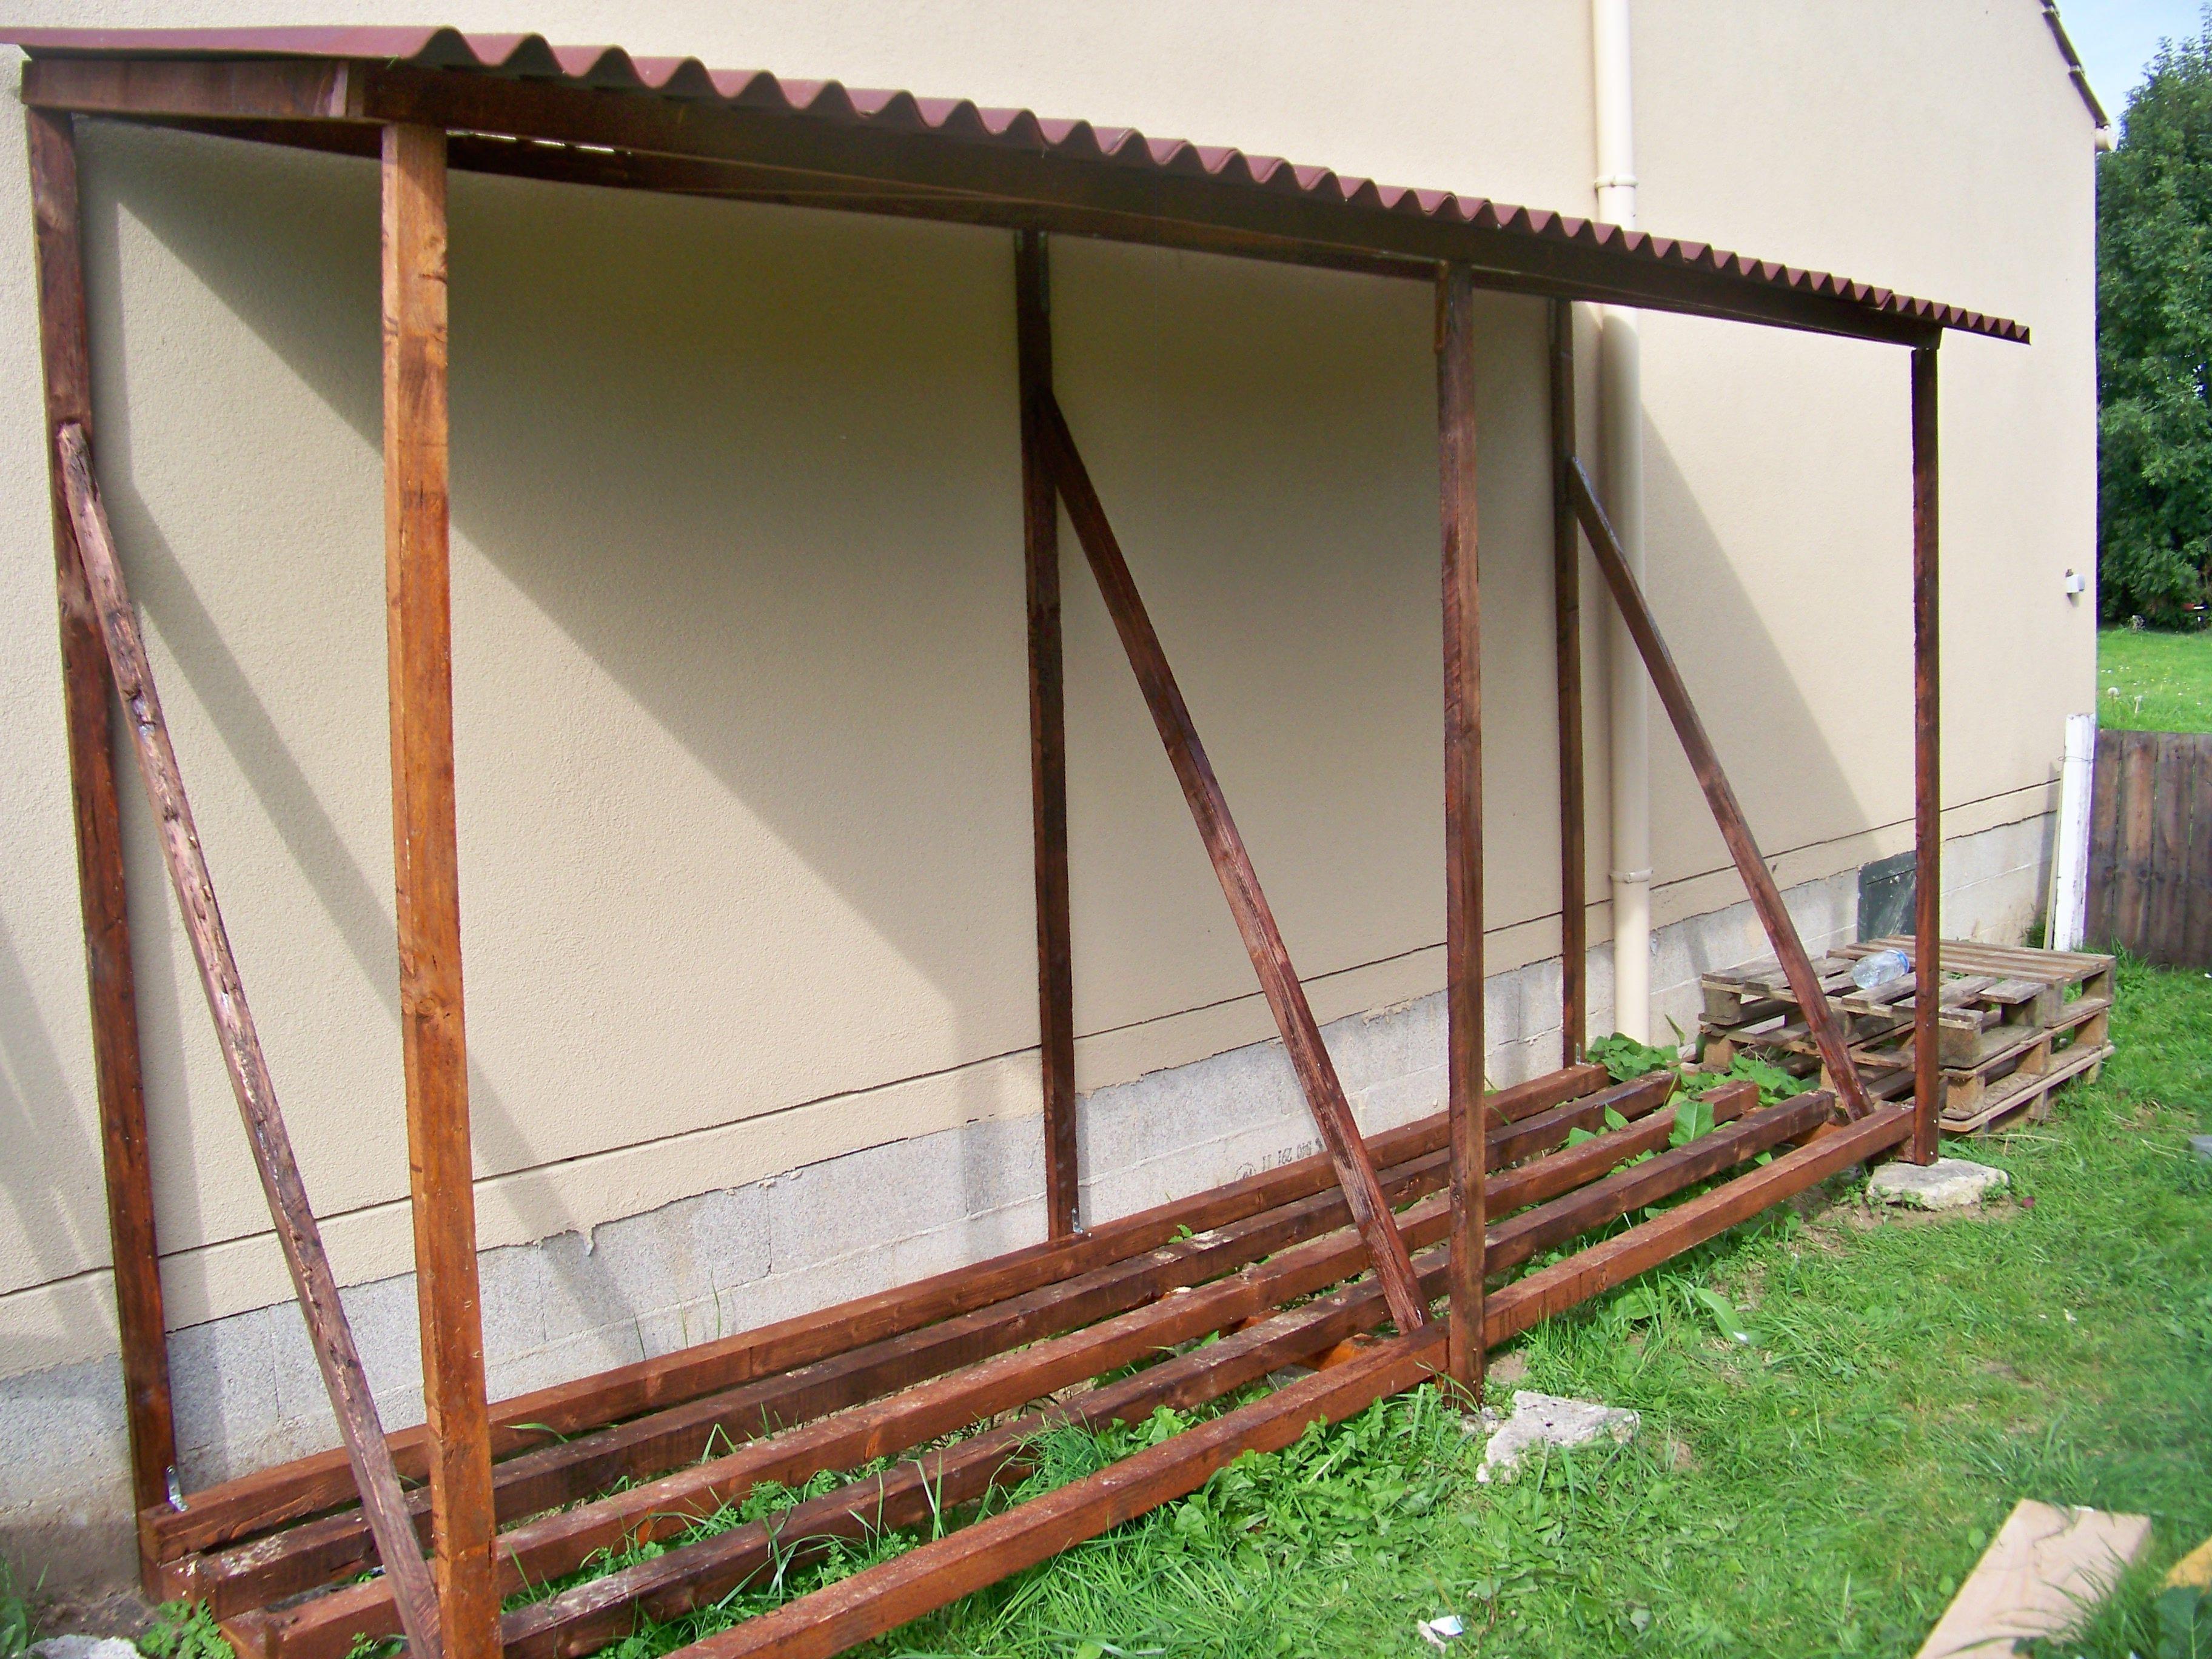 Abri bois chauffage abri jardin chalet vidaxl abri de for Stockage bois chauffage exterieur